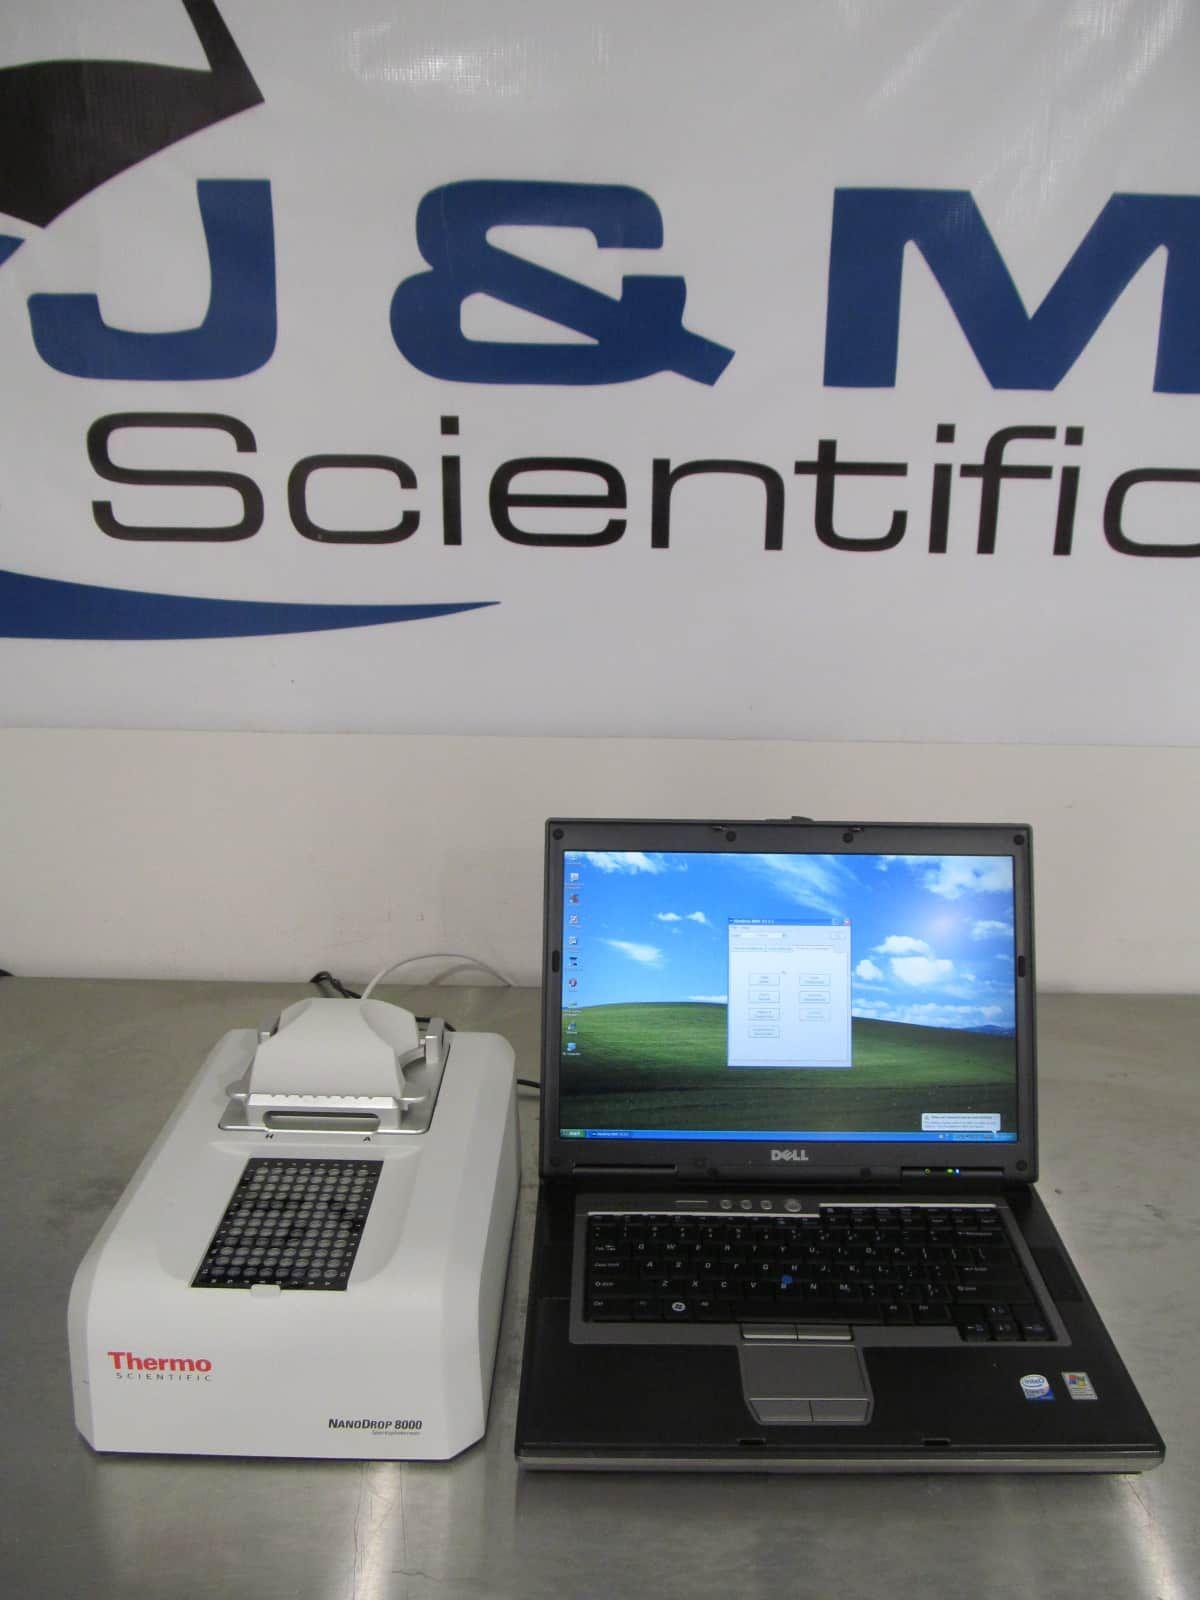 Thermo Nanodrop 8000 Uv-Vis Specrtrophotometer